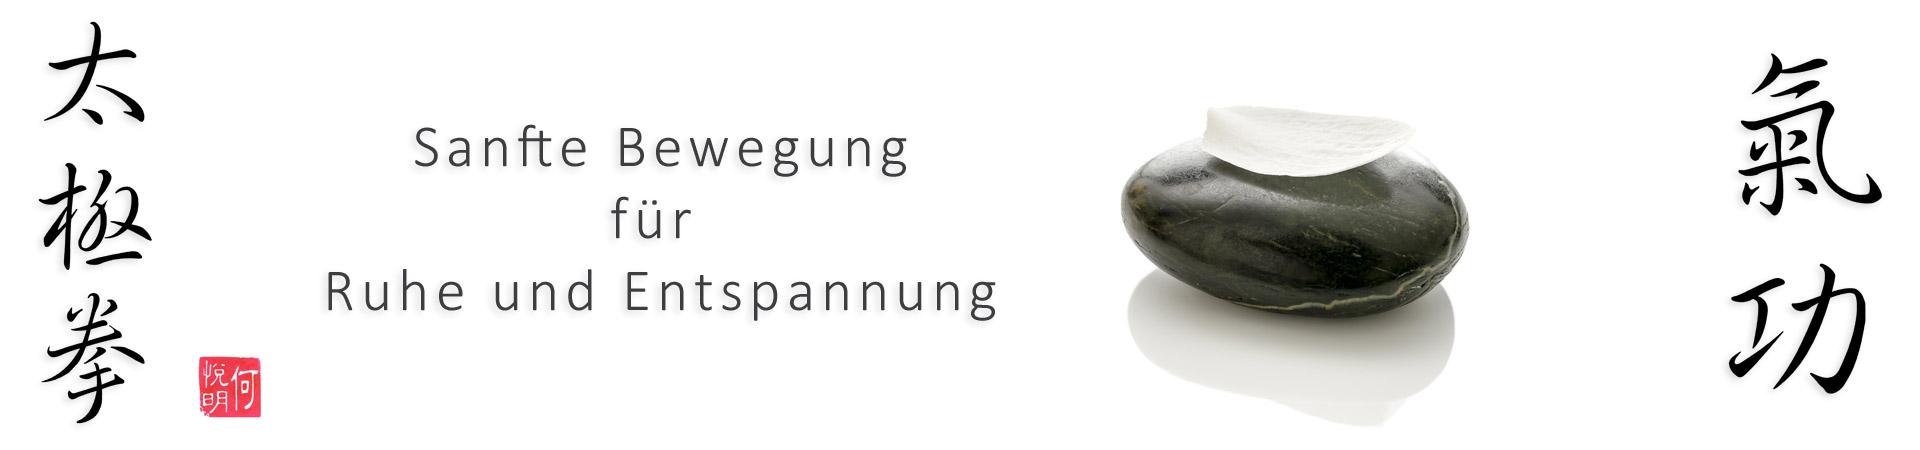 Bernd_Haber_Tai-Chi_Qi-Gong_slide07